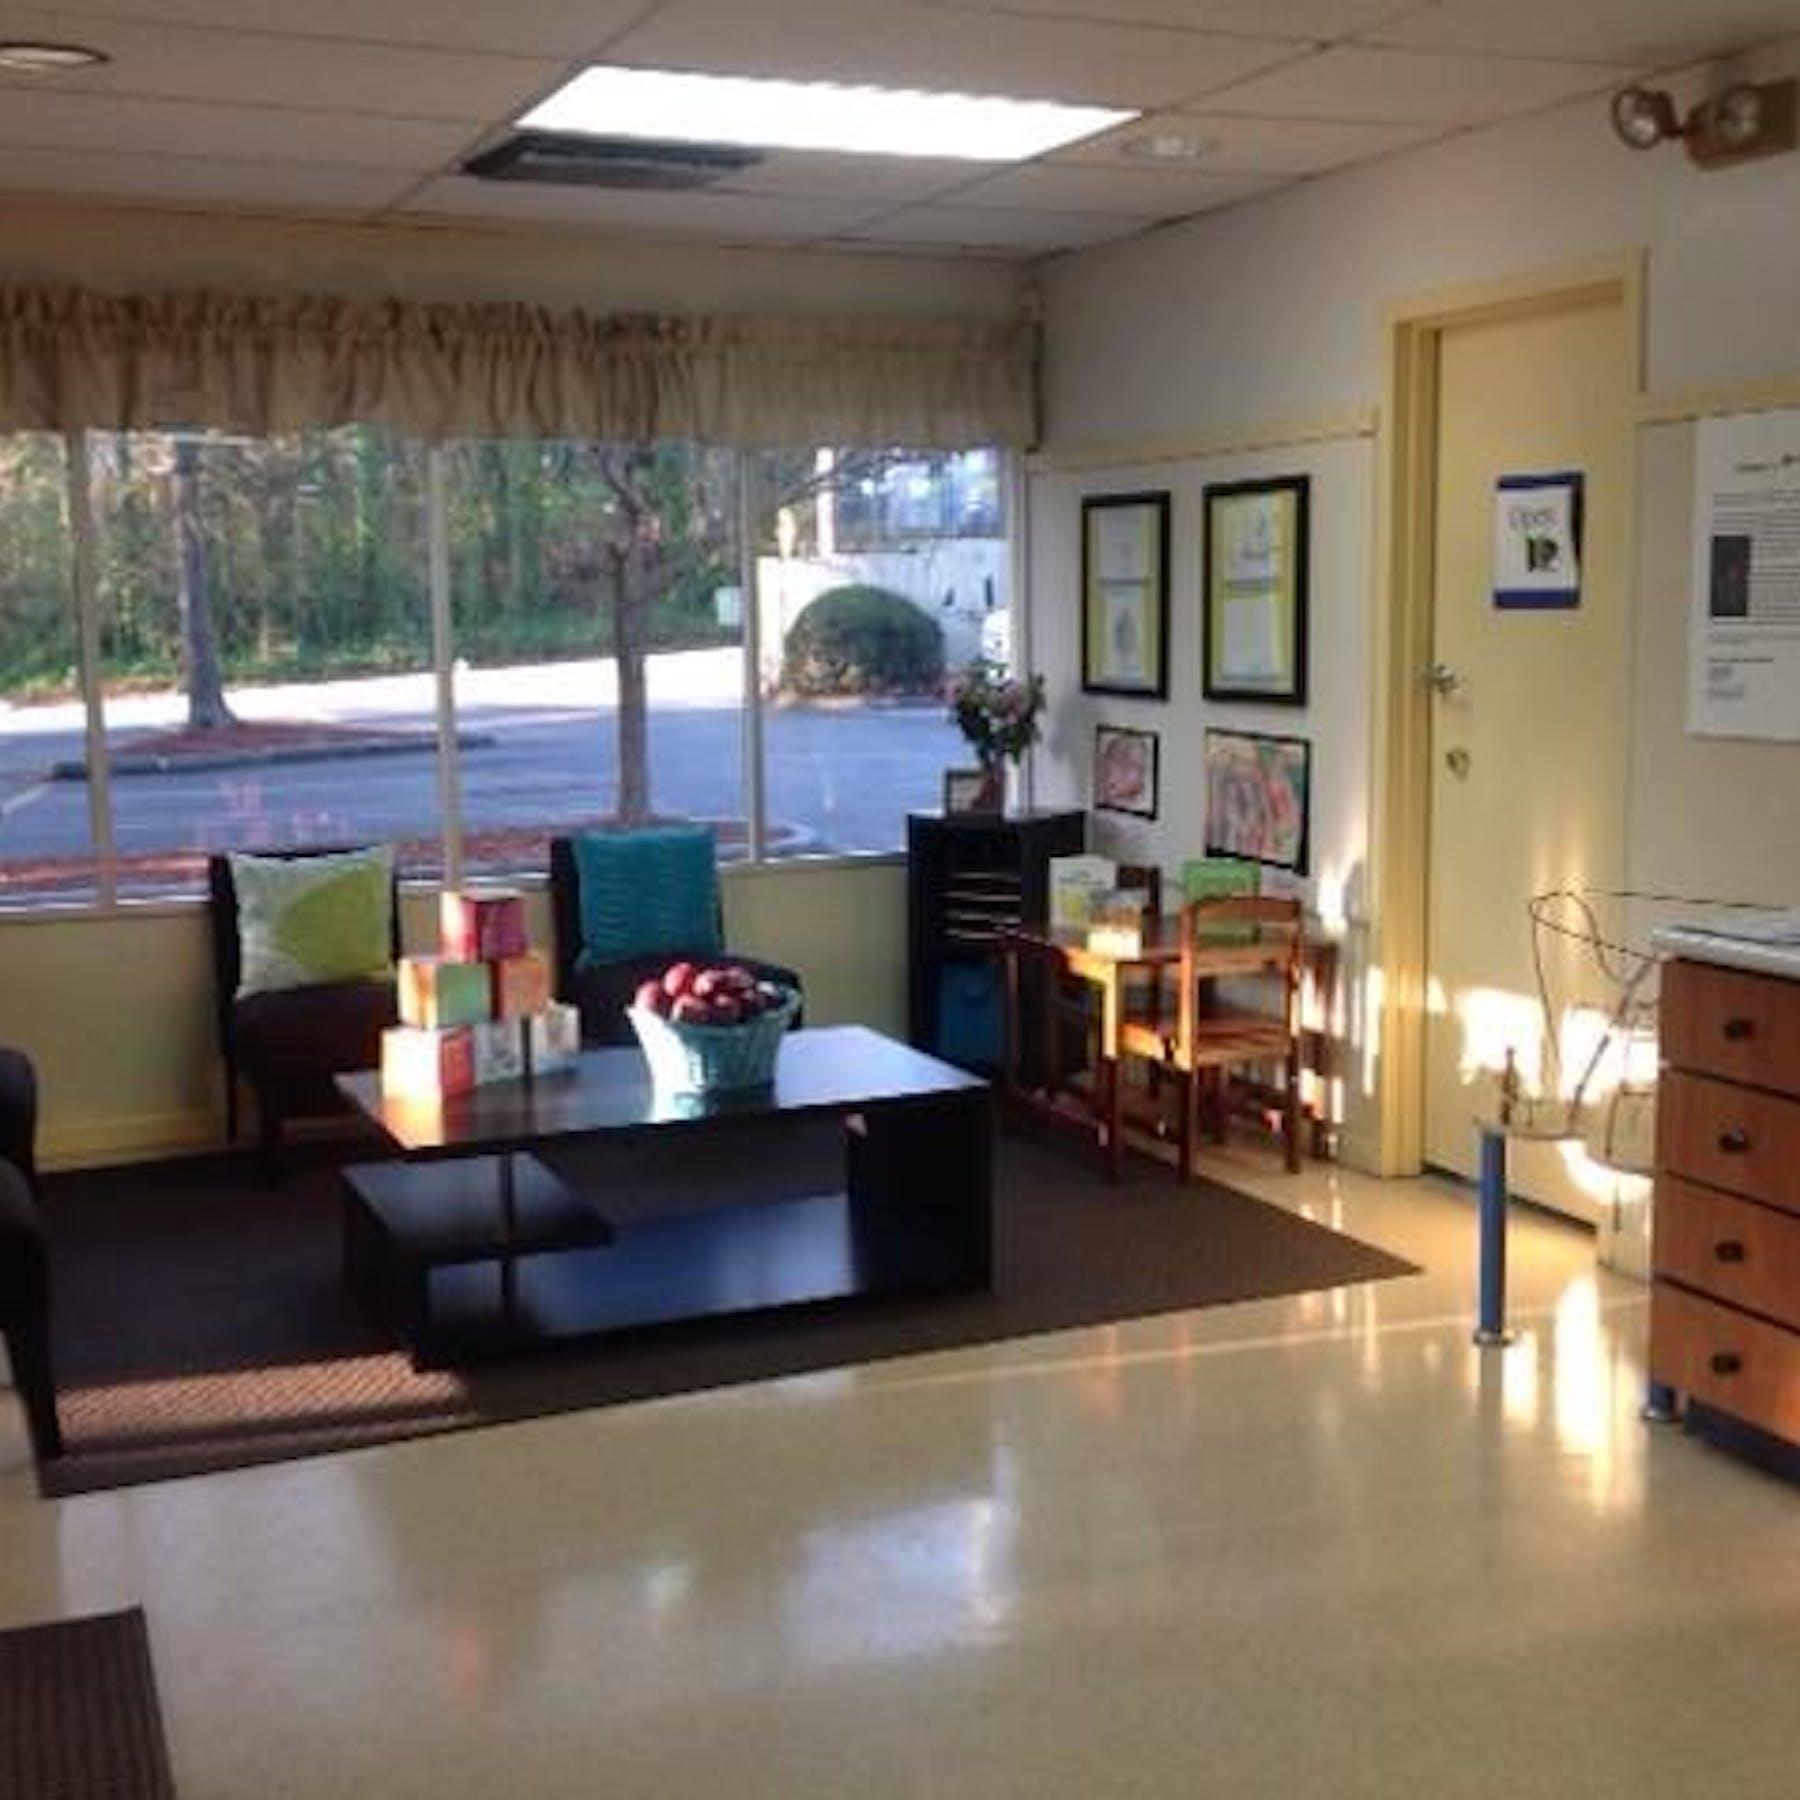 Old Chamblee-Tucker KinderCare - Daycare in Atlanta, GA - Winnie